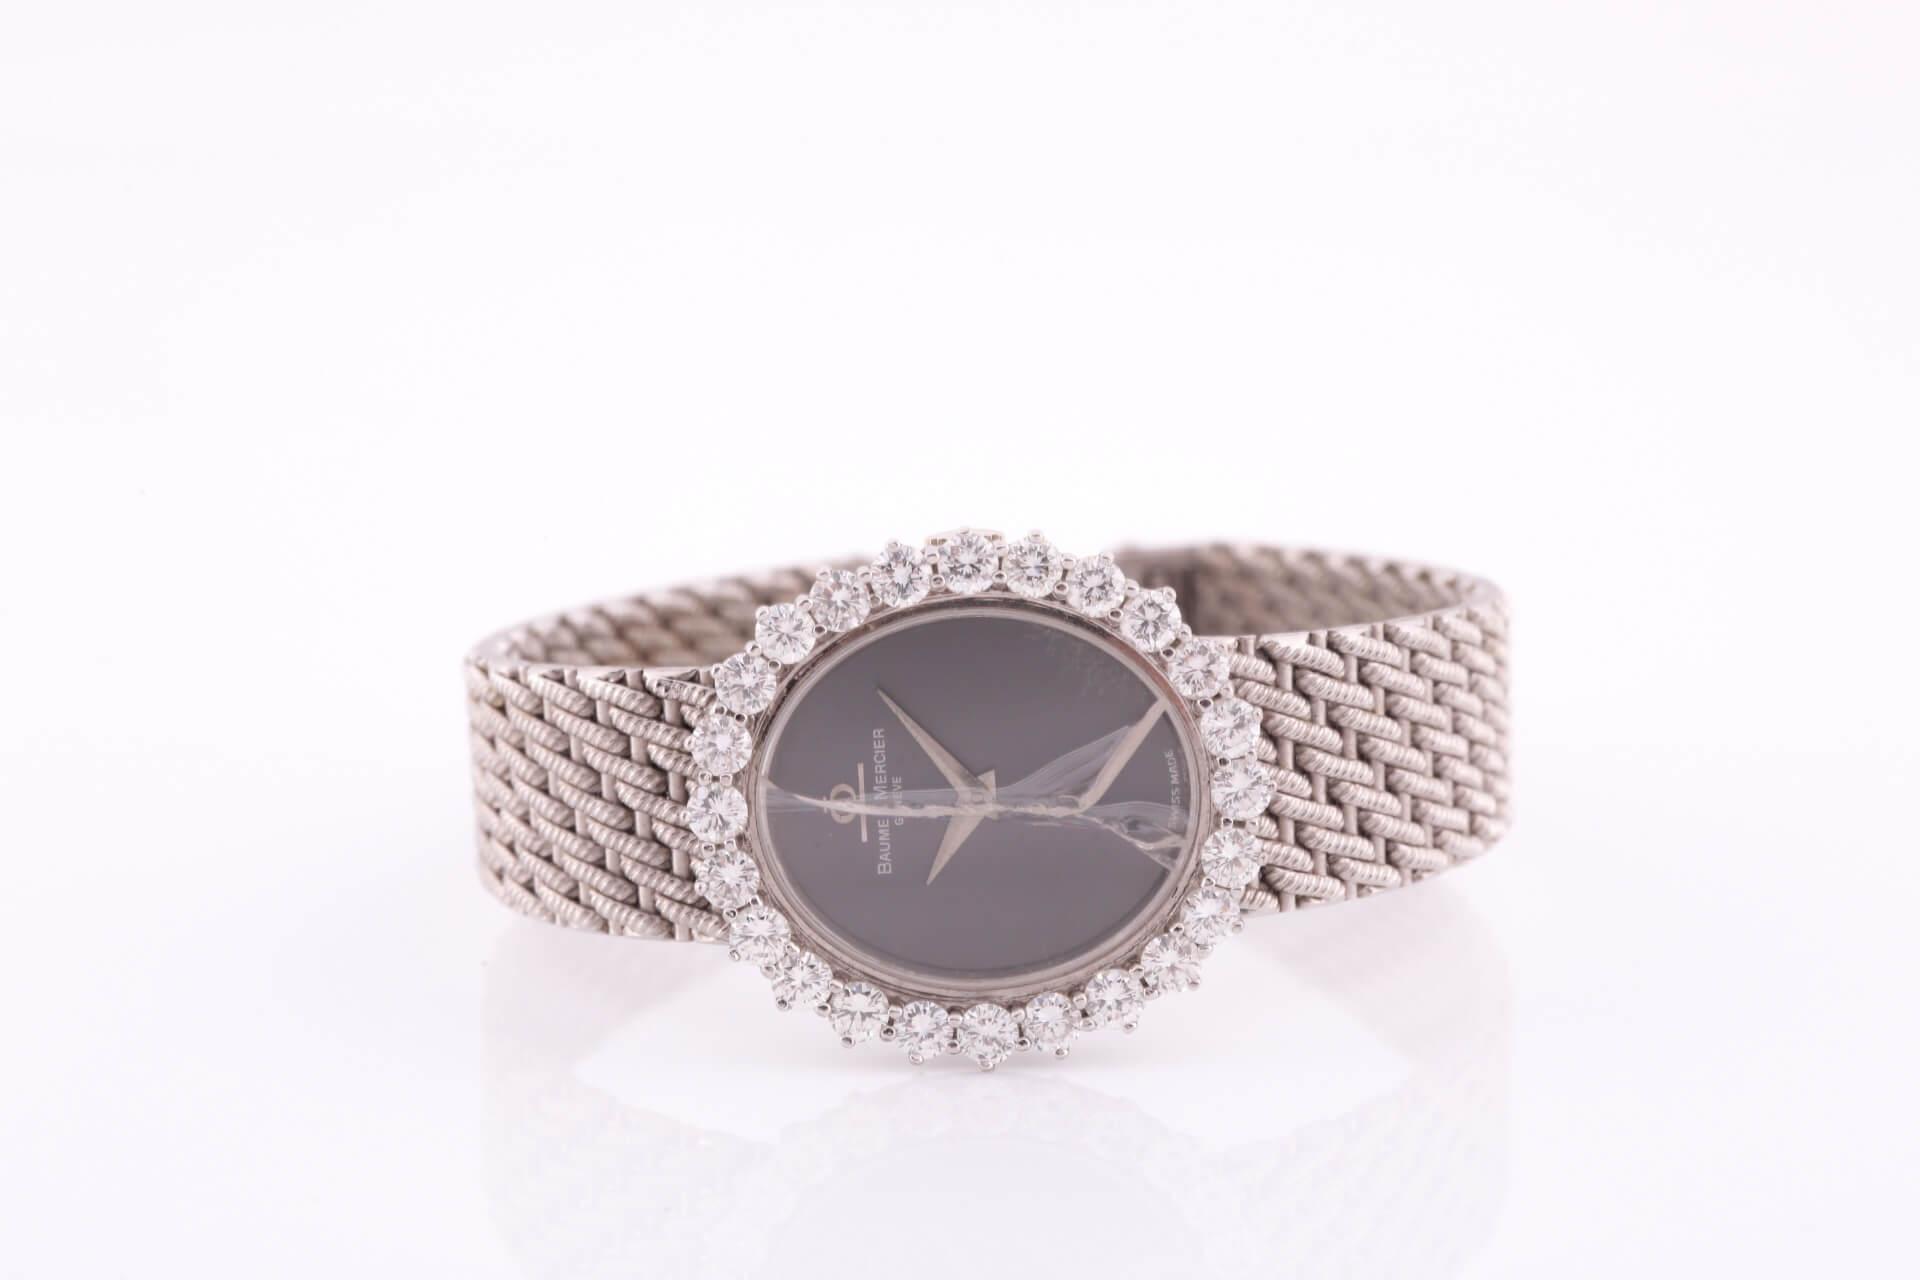 Baume and Mercier wristwatch